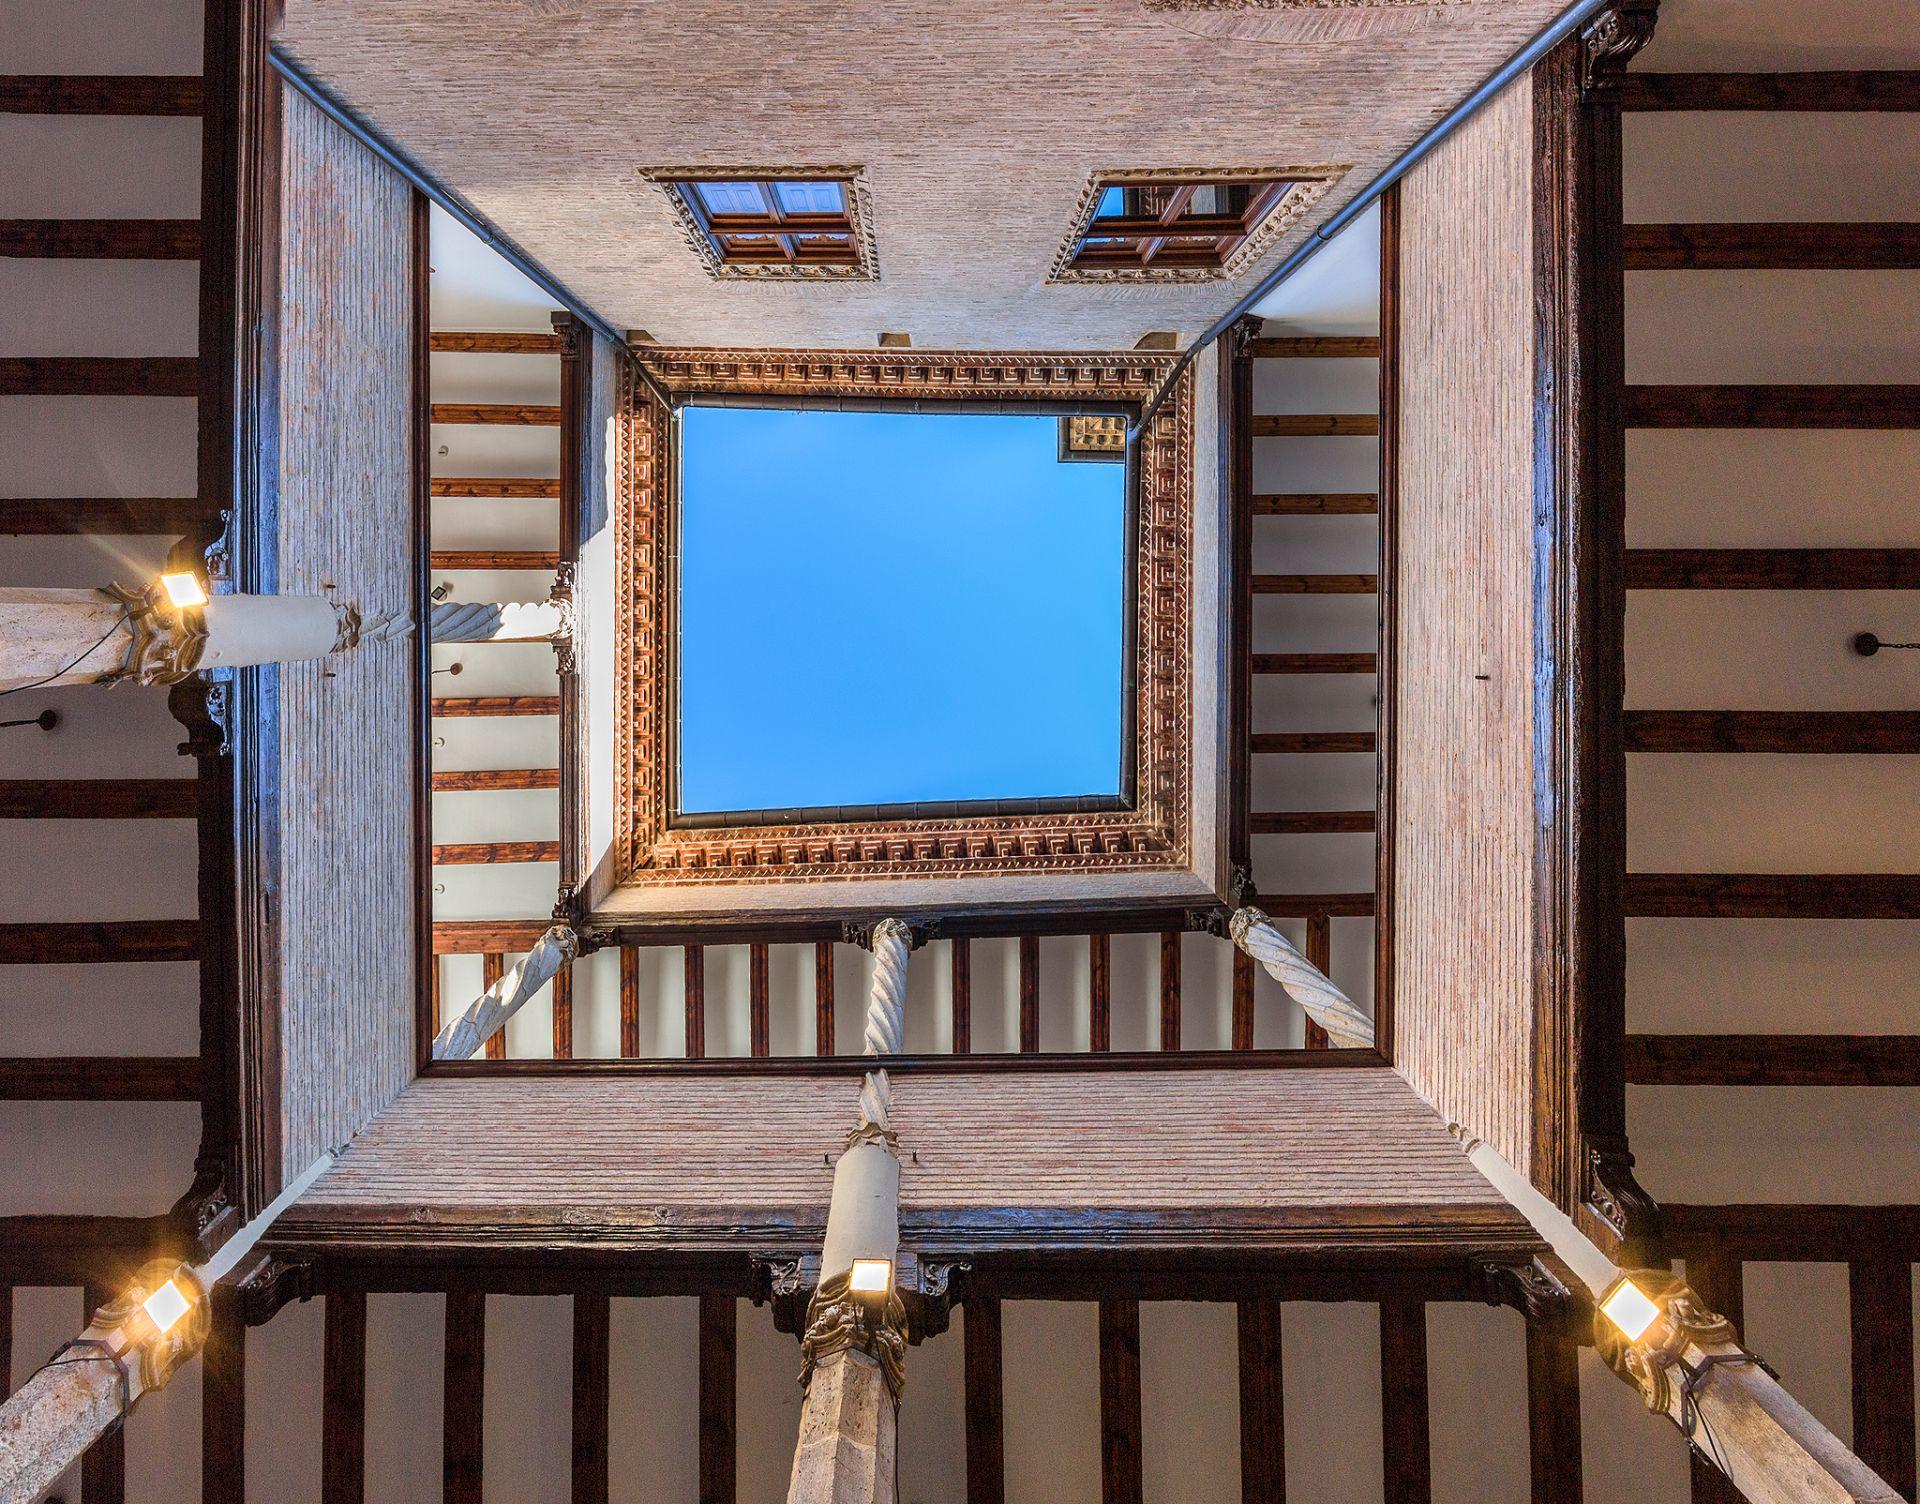 Plaza de San martin de Estella - Lizarra - Casa de Fray Diego de Estella